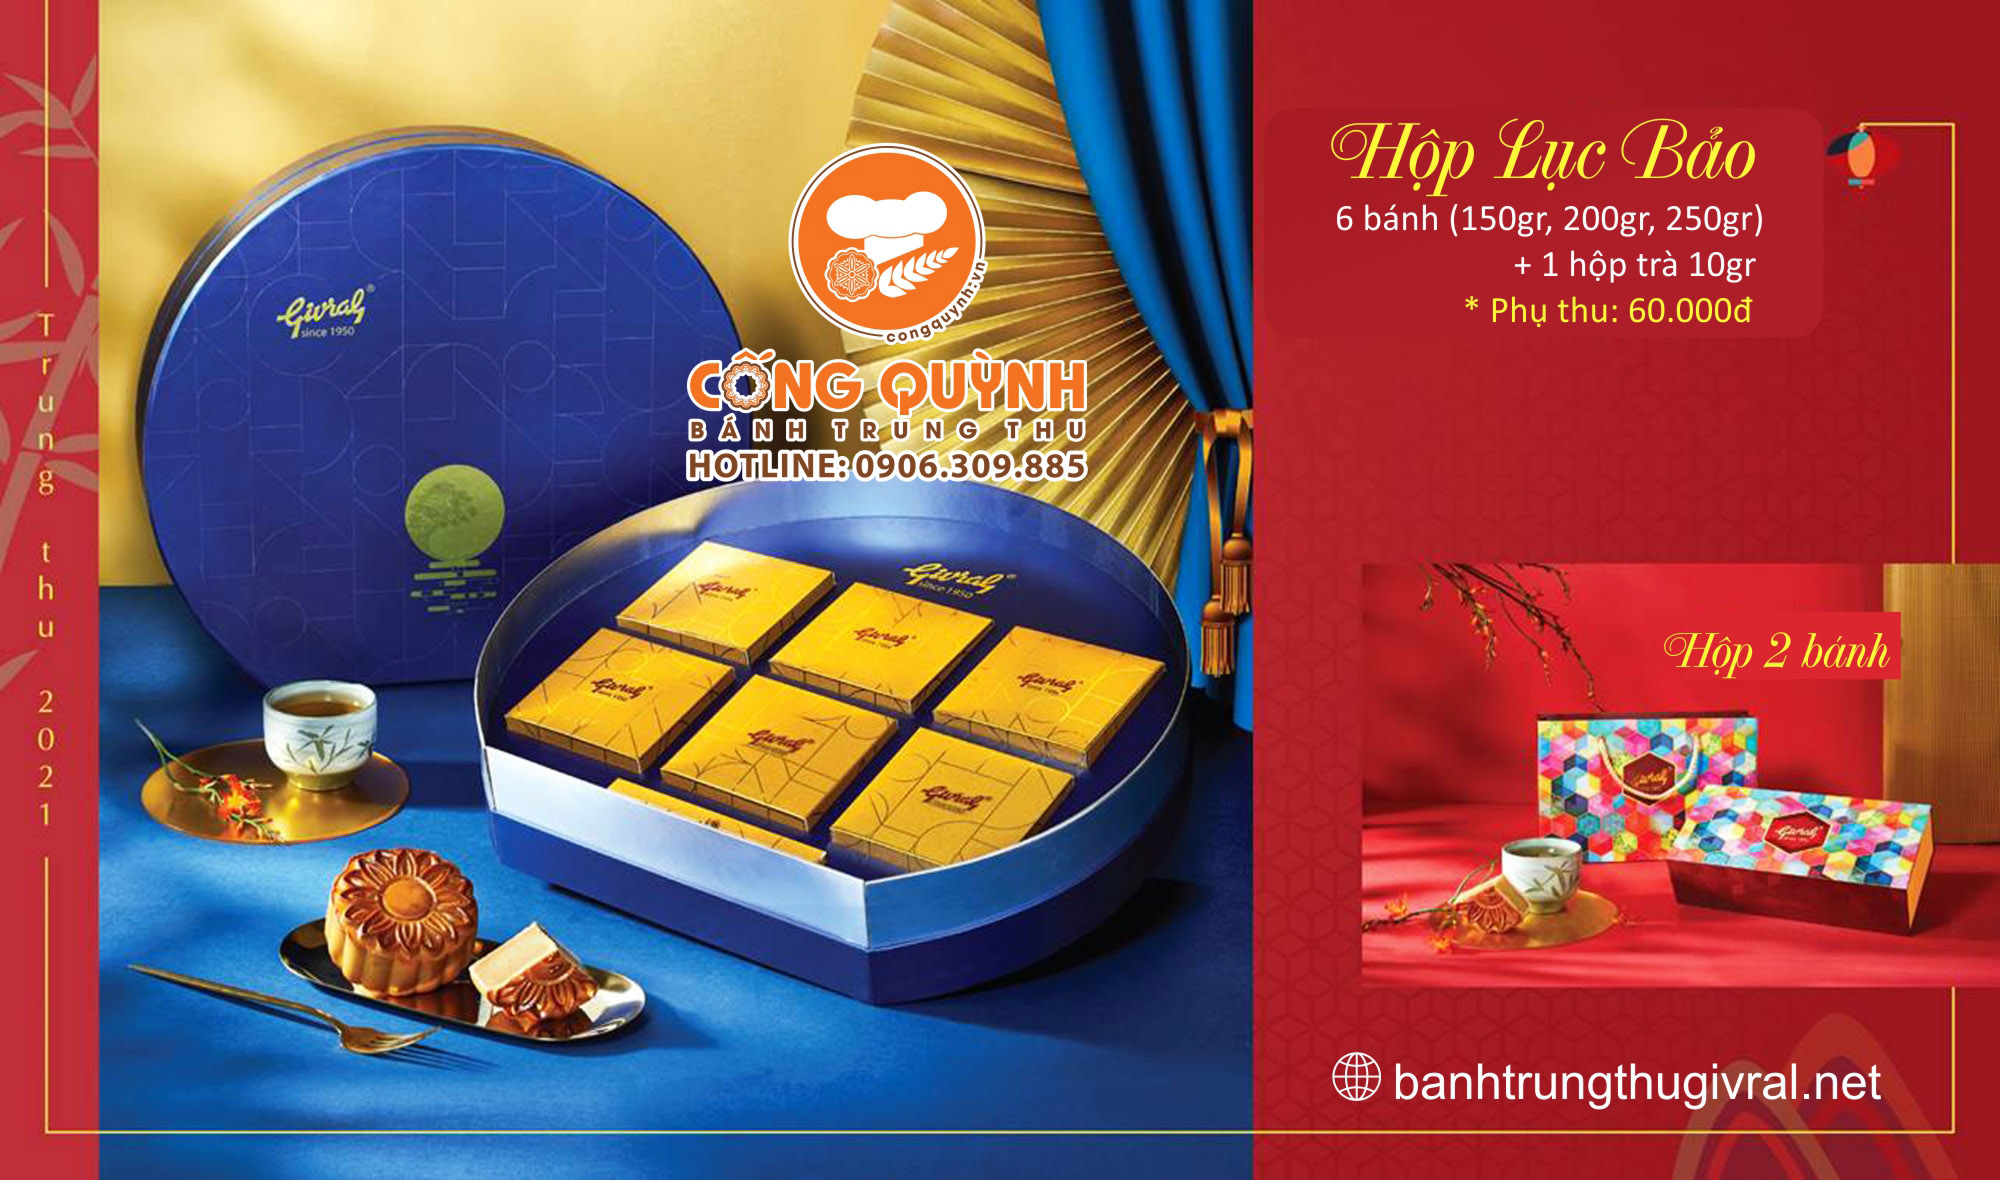 Banh Trung Thu_Givral_Hop luc bao_Detail